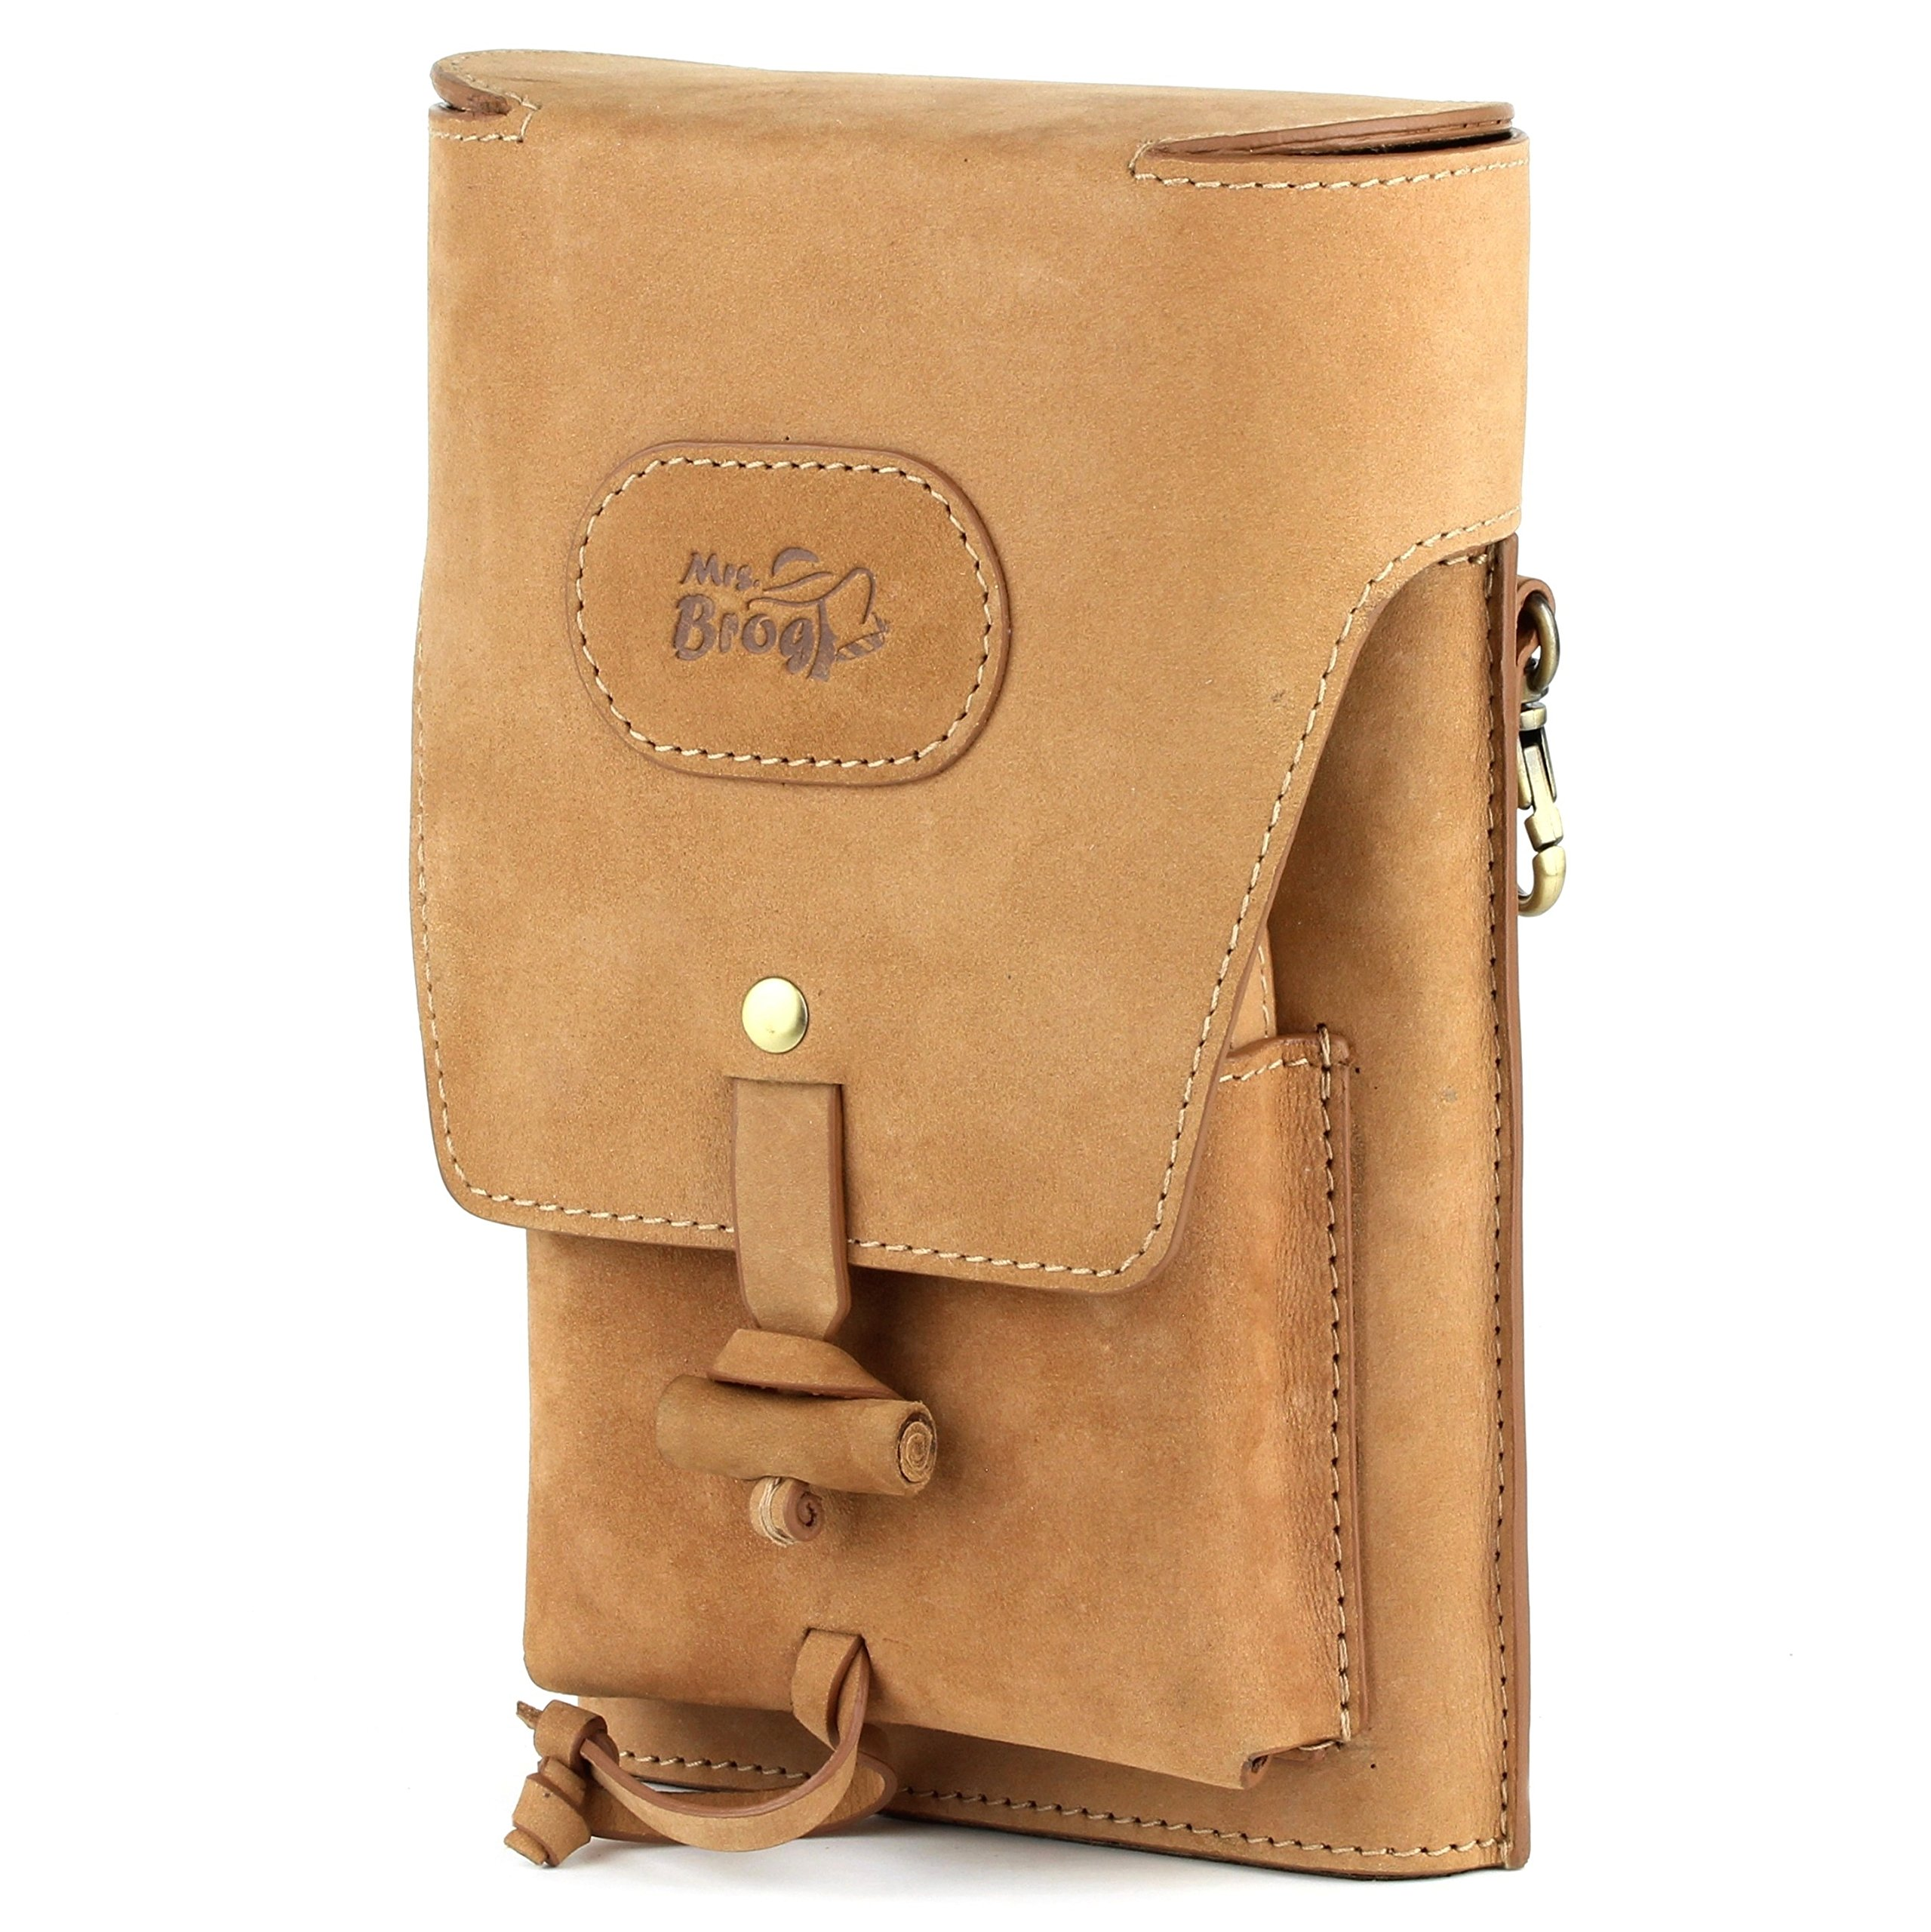 Hunting Cigar Humidor Case - Best Cigar Strap Hanger - Heavey Diesel Saddle Leather - [Tan]